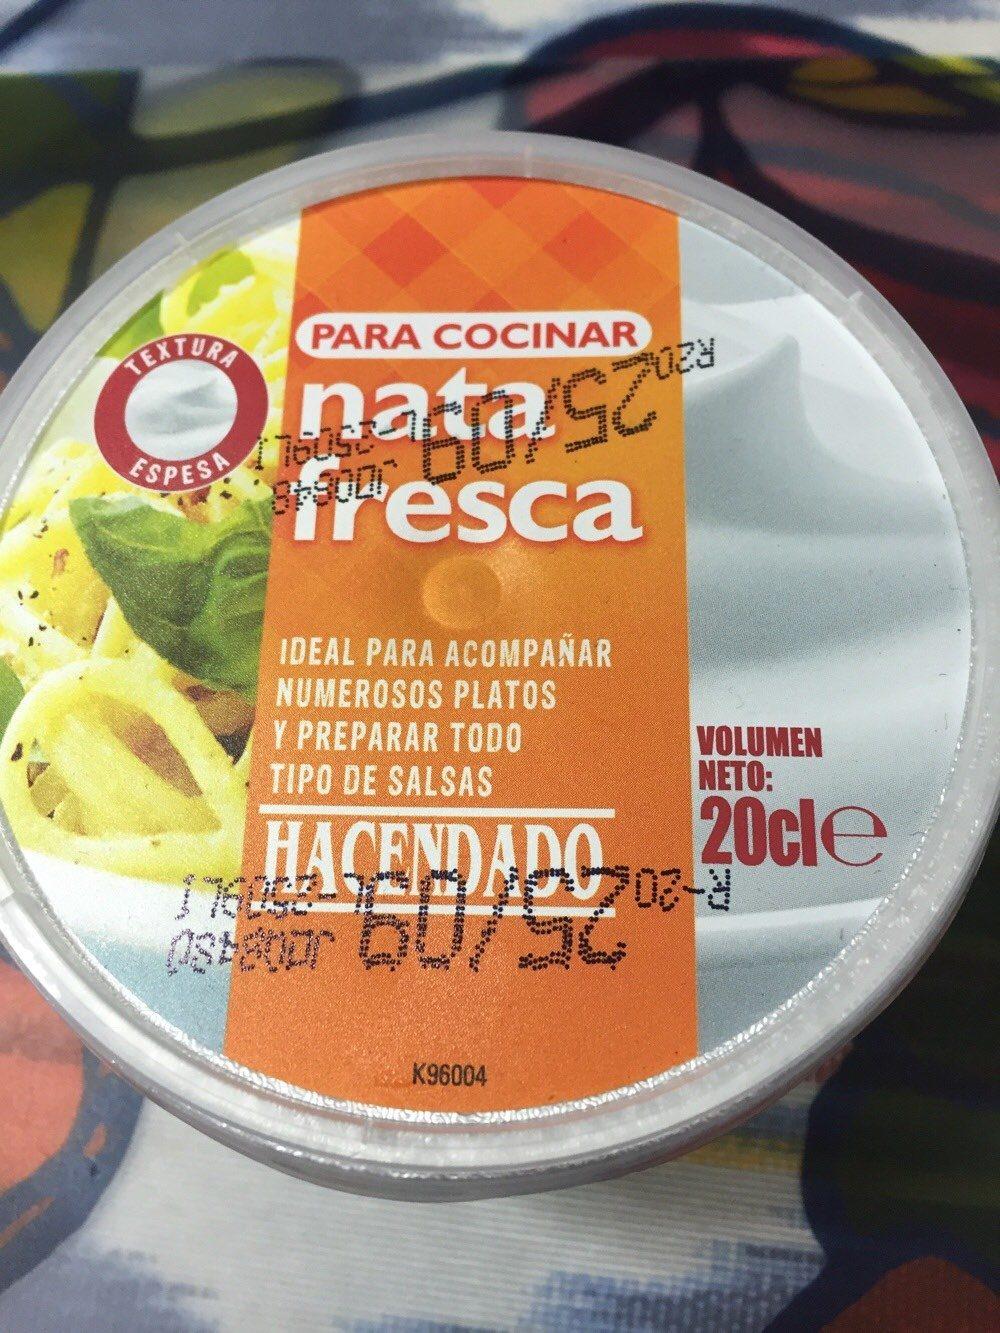 Nata fresca - Produit